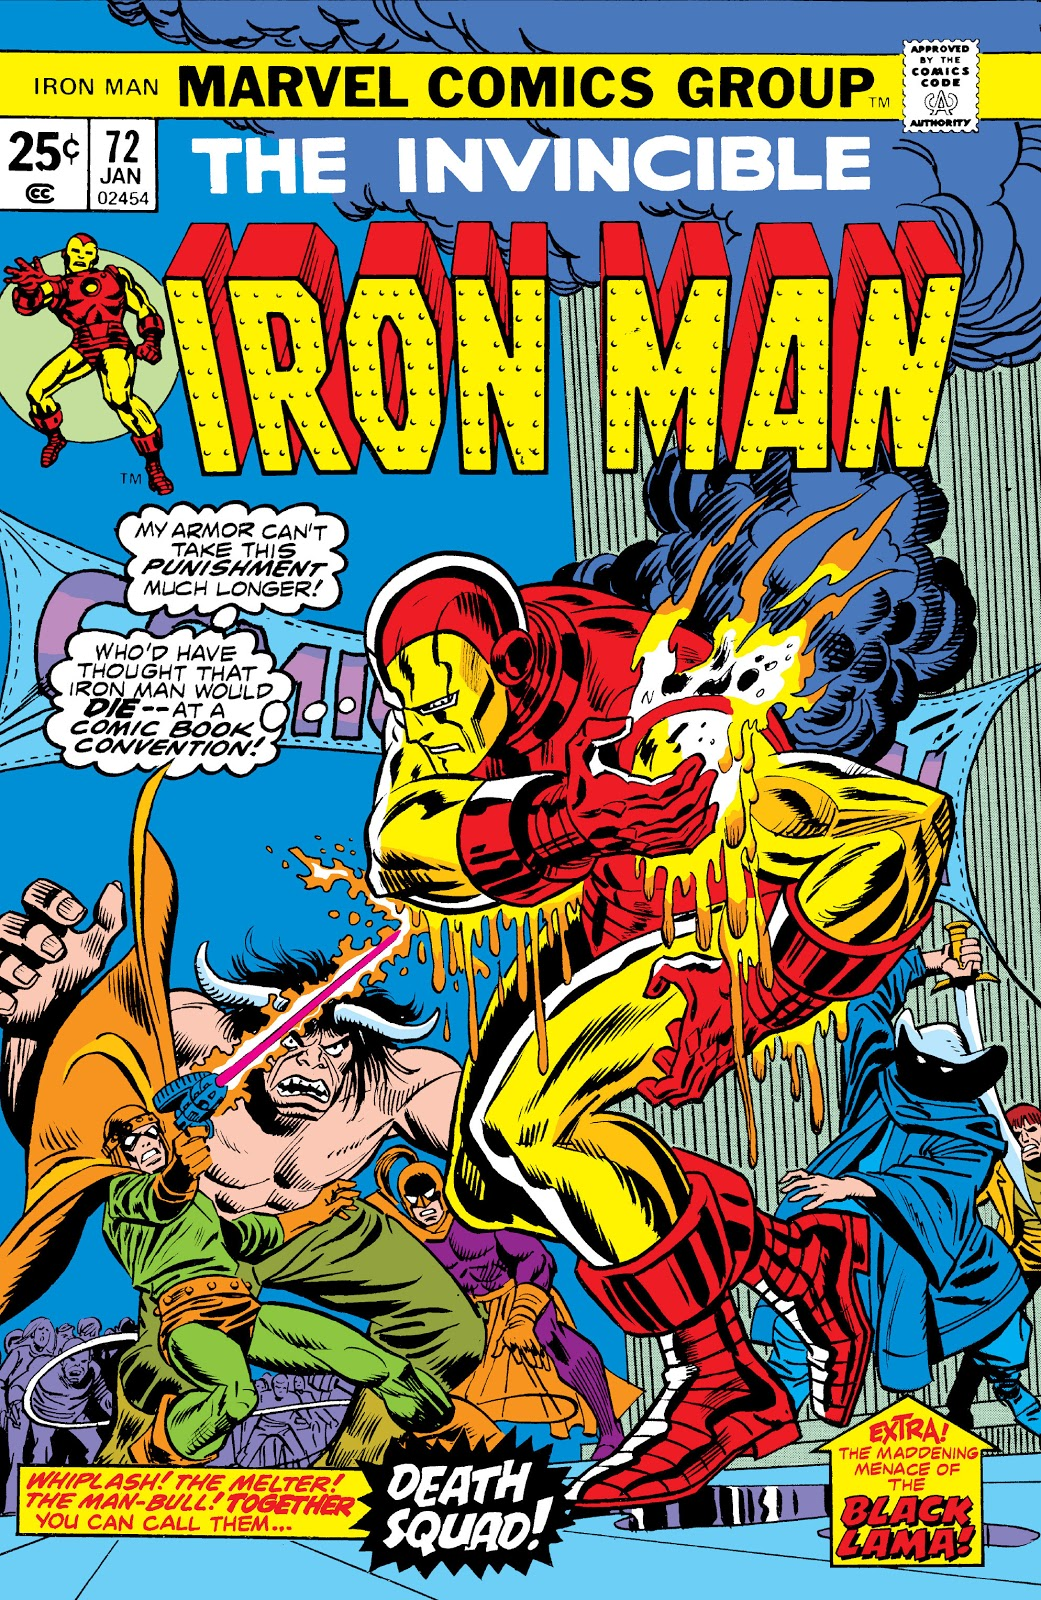 Iron_Man_Vol_1_72.jpg